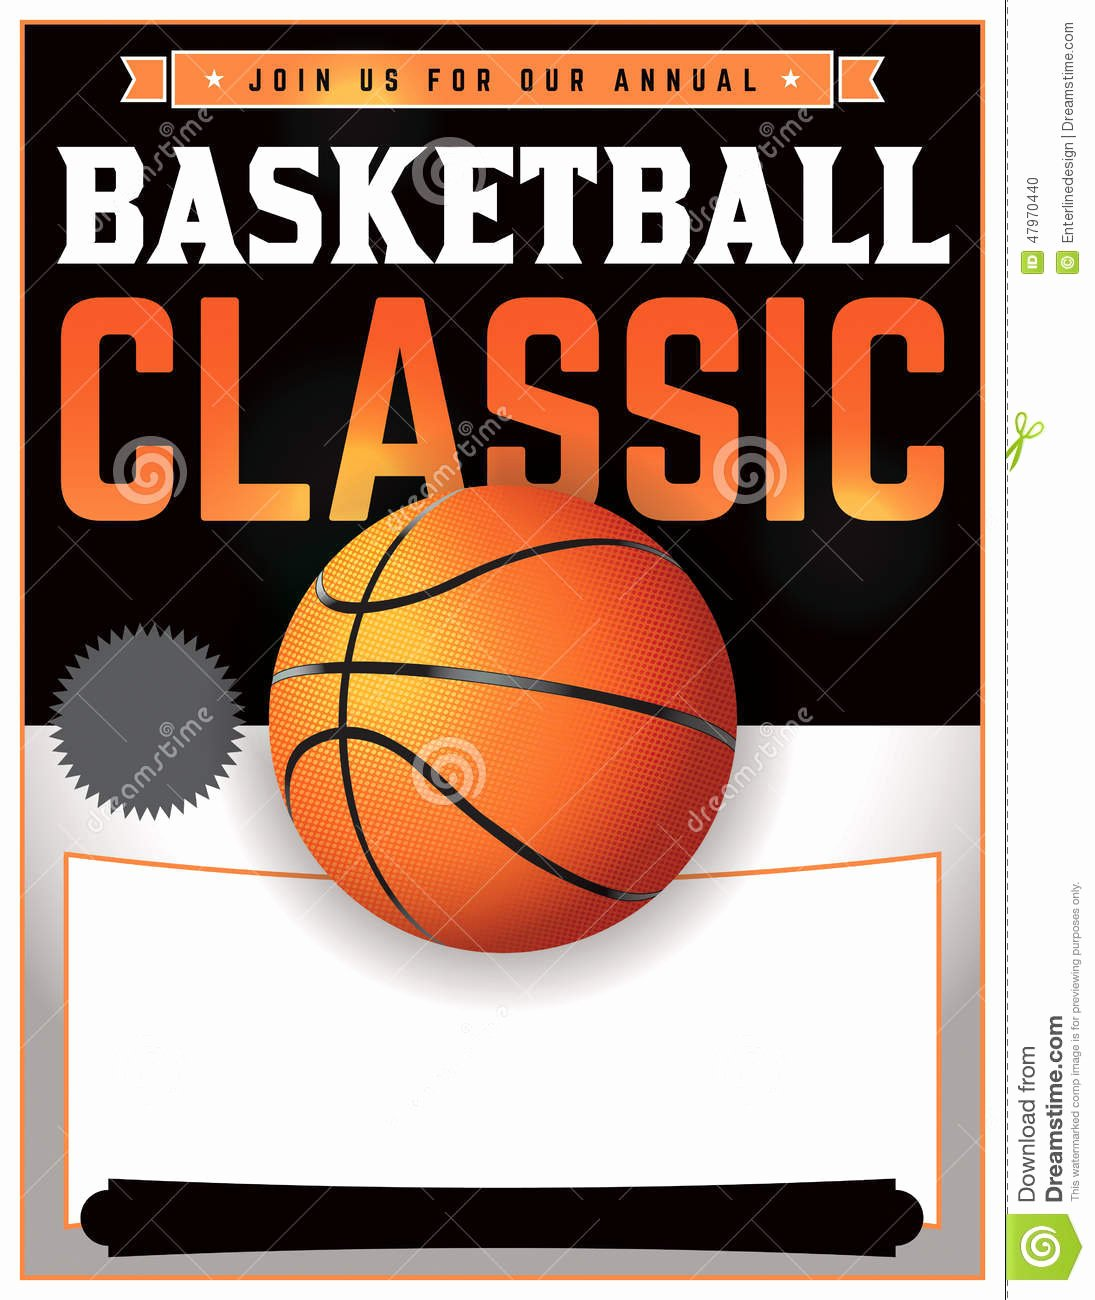 Basketball Flyer Template Free Inspirational Basketball tournament Illustration Stock Illustration